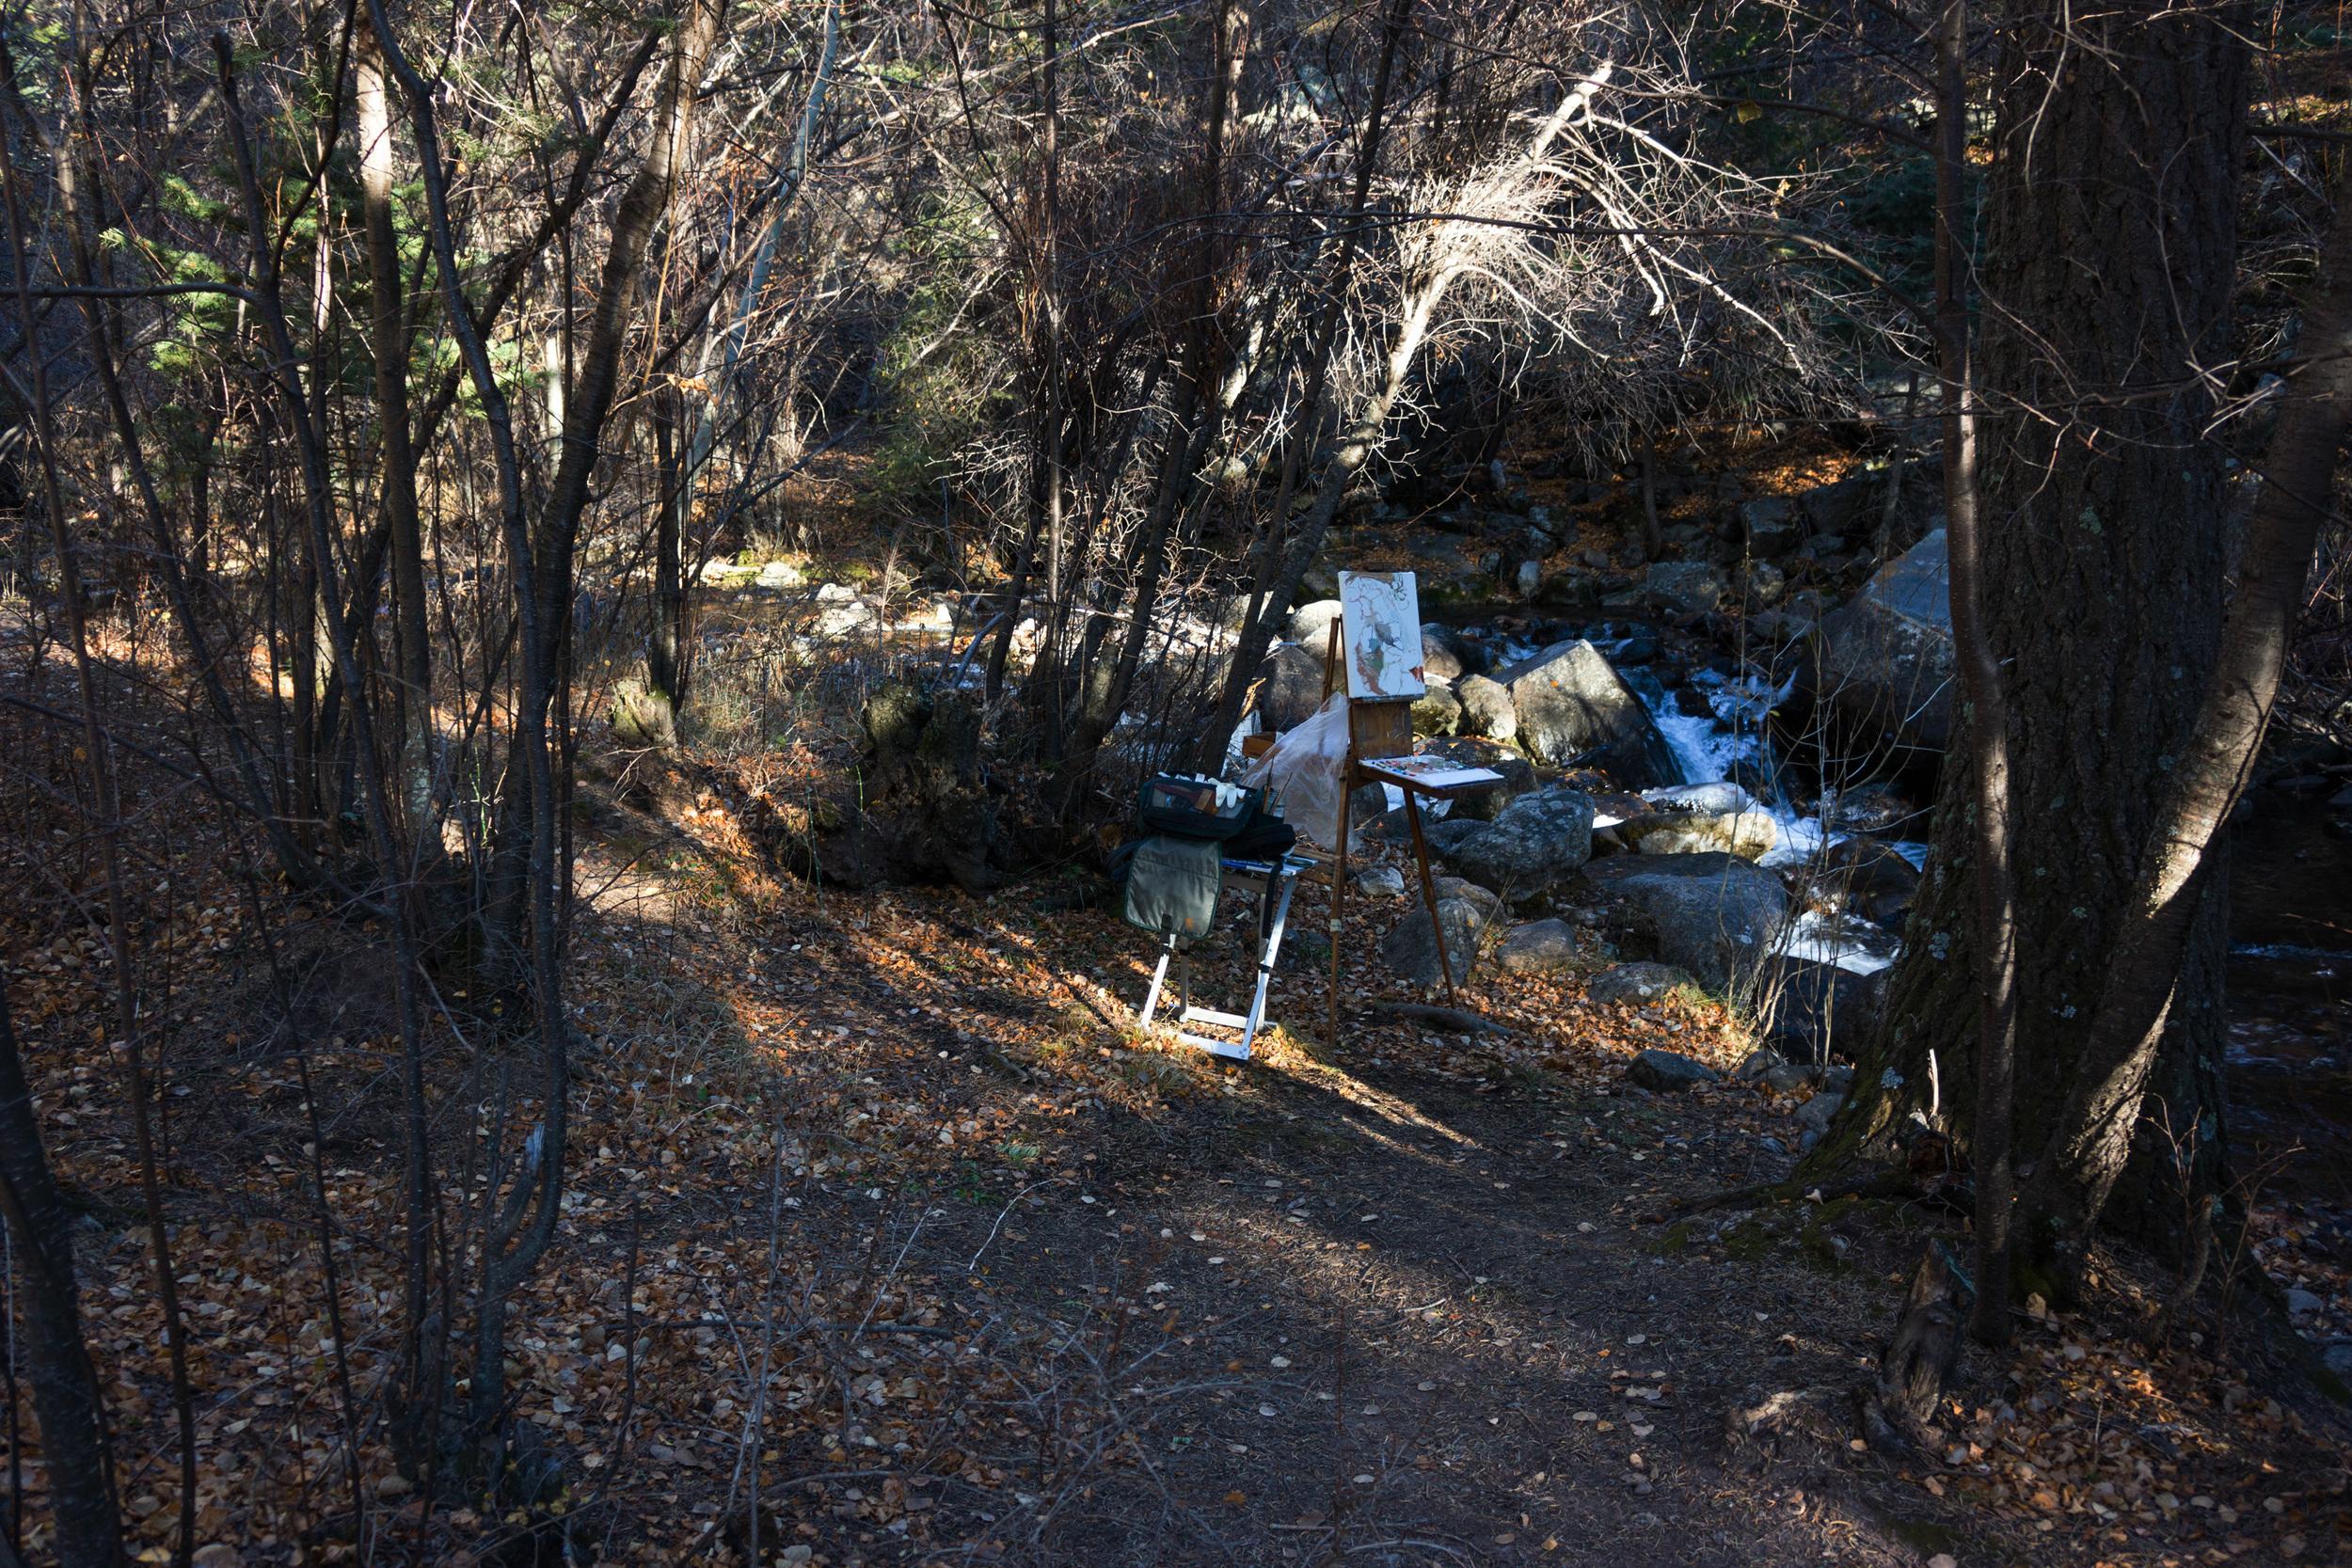 site-11.02.13 LR-RAW n. crestone creek scene 1 16x16.jpg